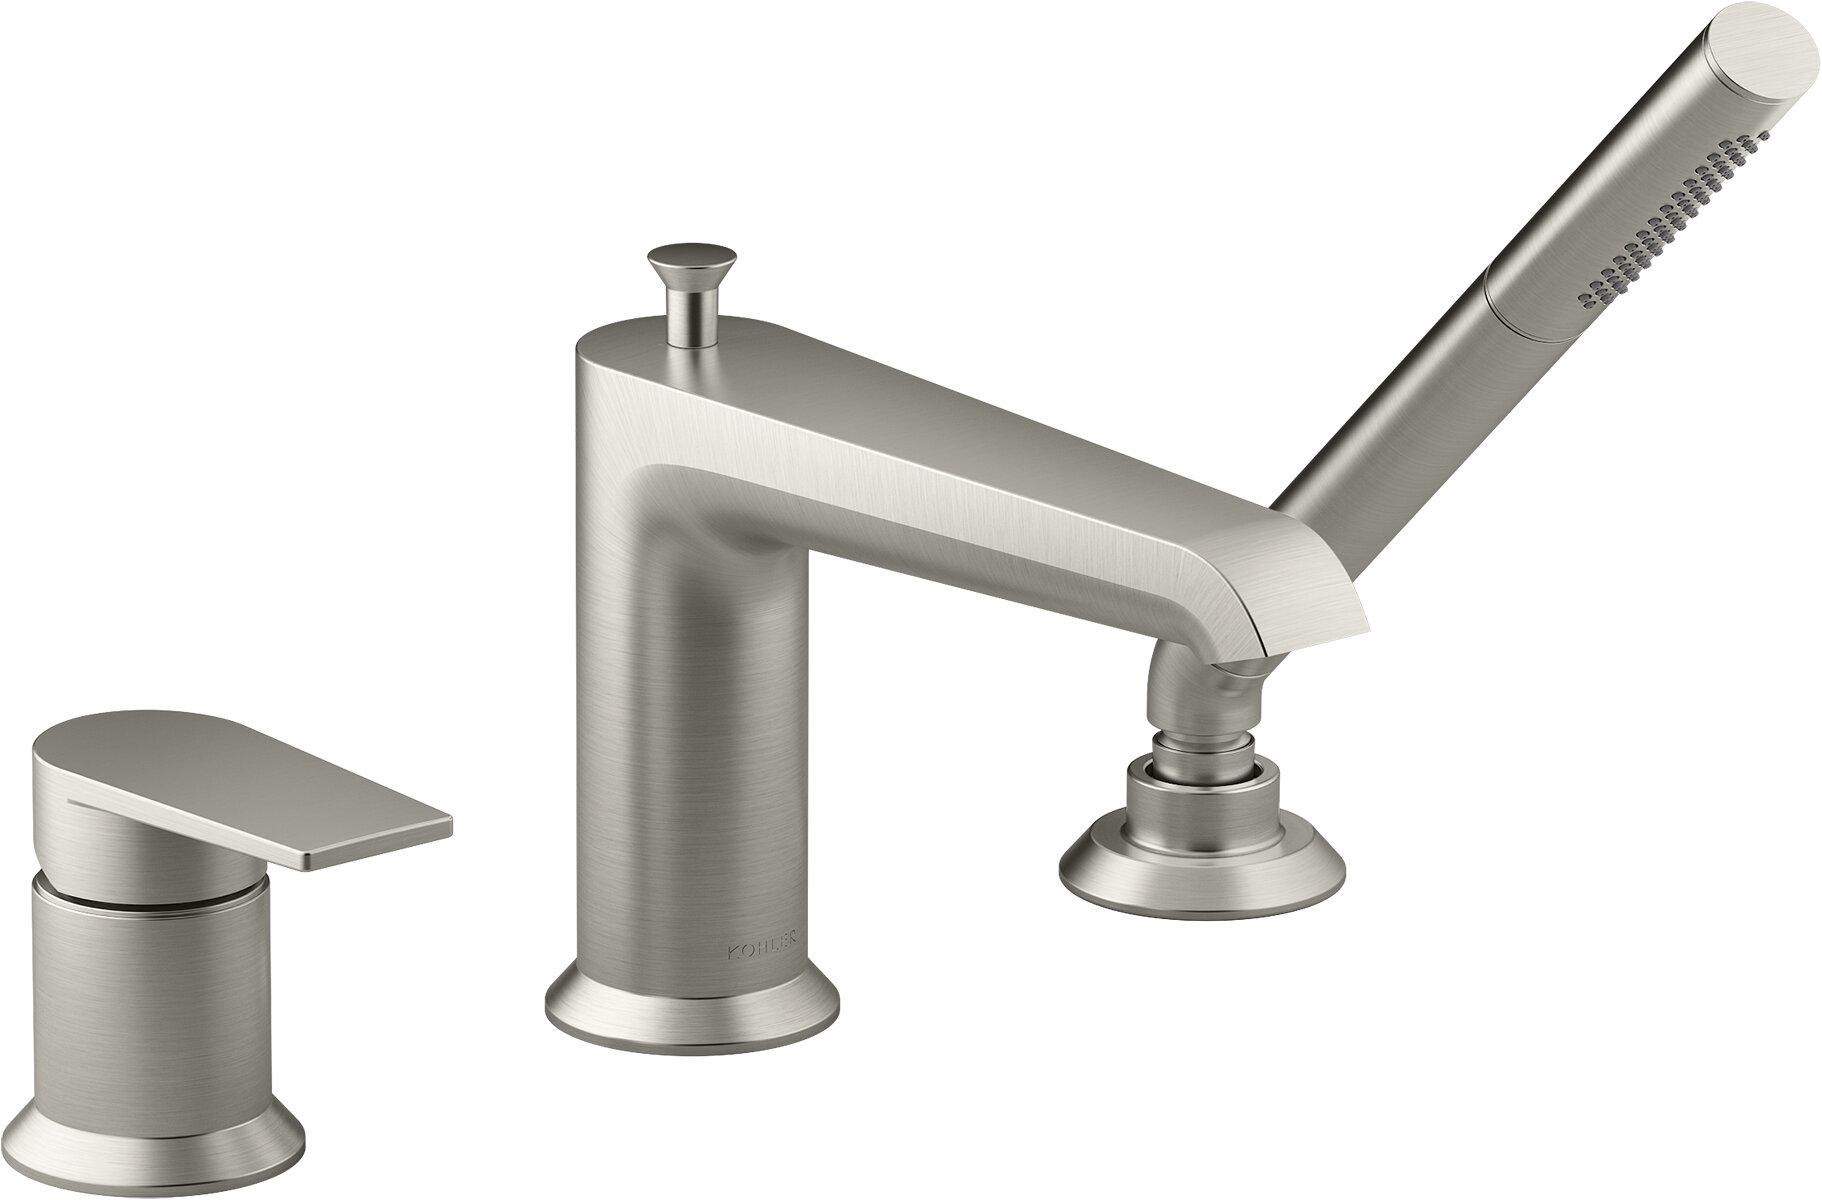 Kohler Hint Single Handle Deck Mounted Roman Tub Faucet Trim With Diverter Reviews Wayfair